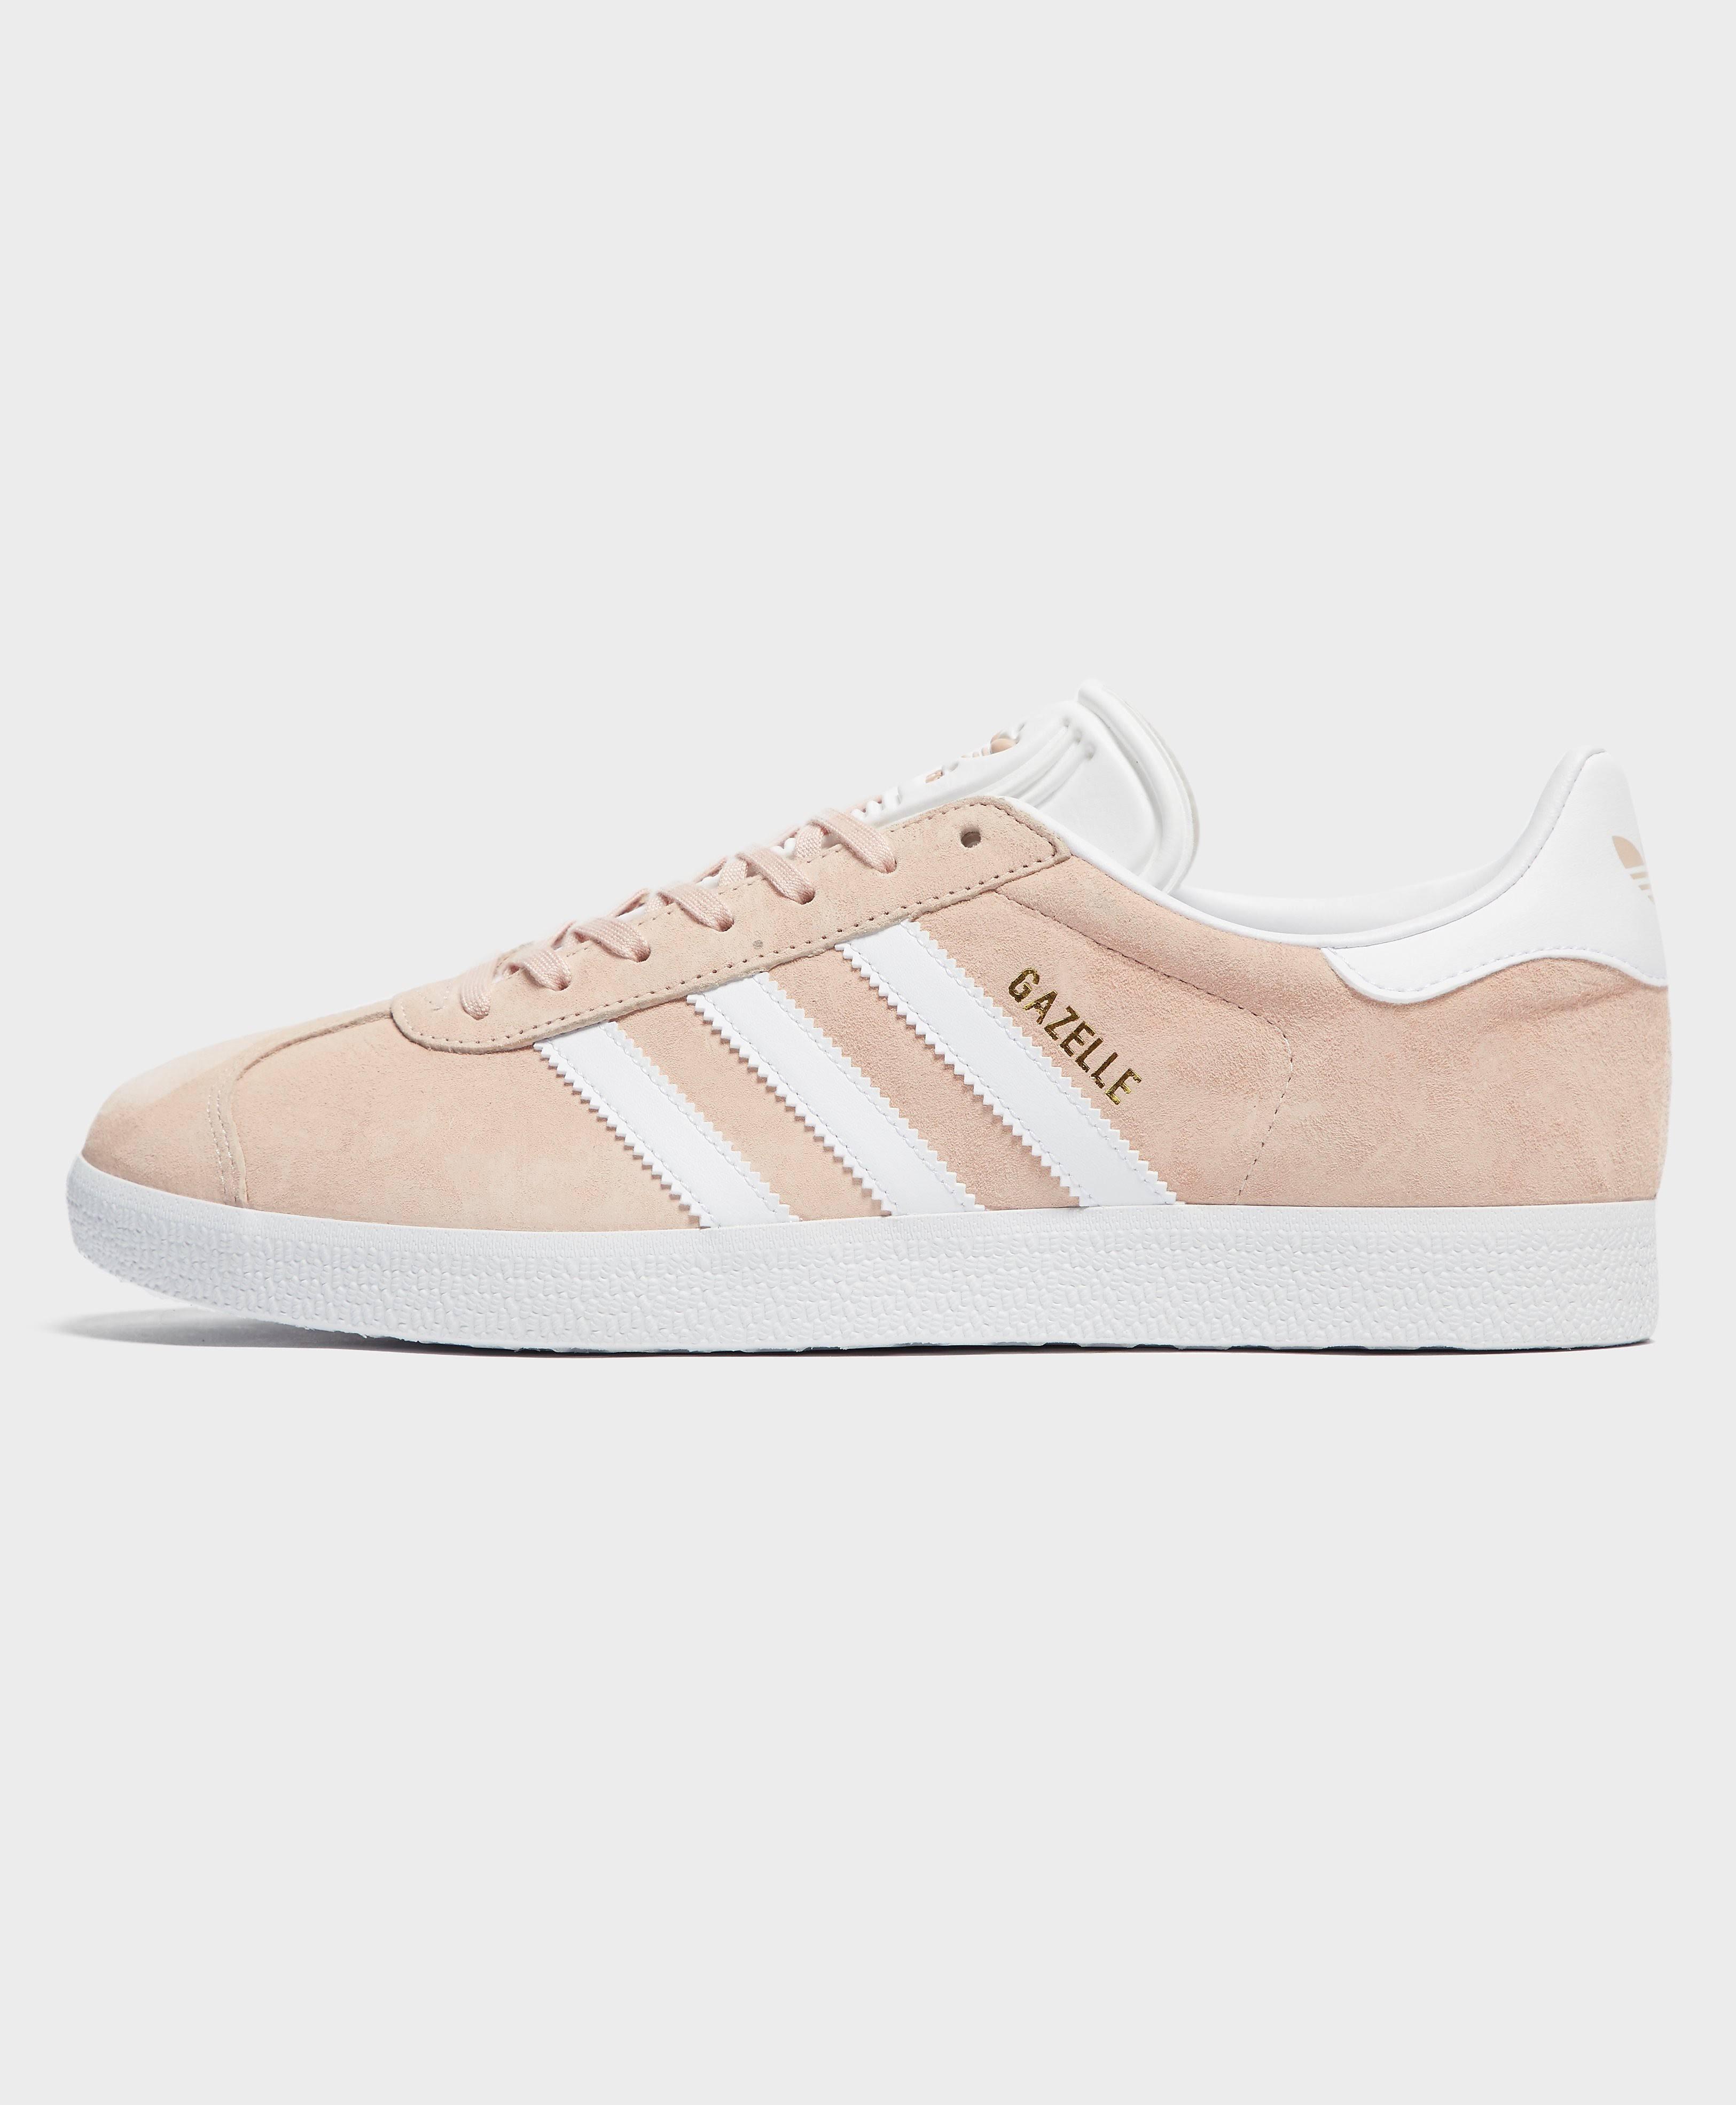 Adidas Originals Gazelle Vapour Pink